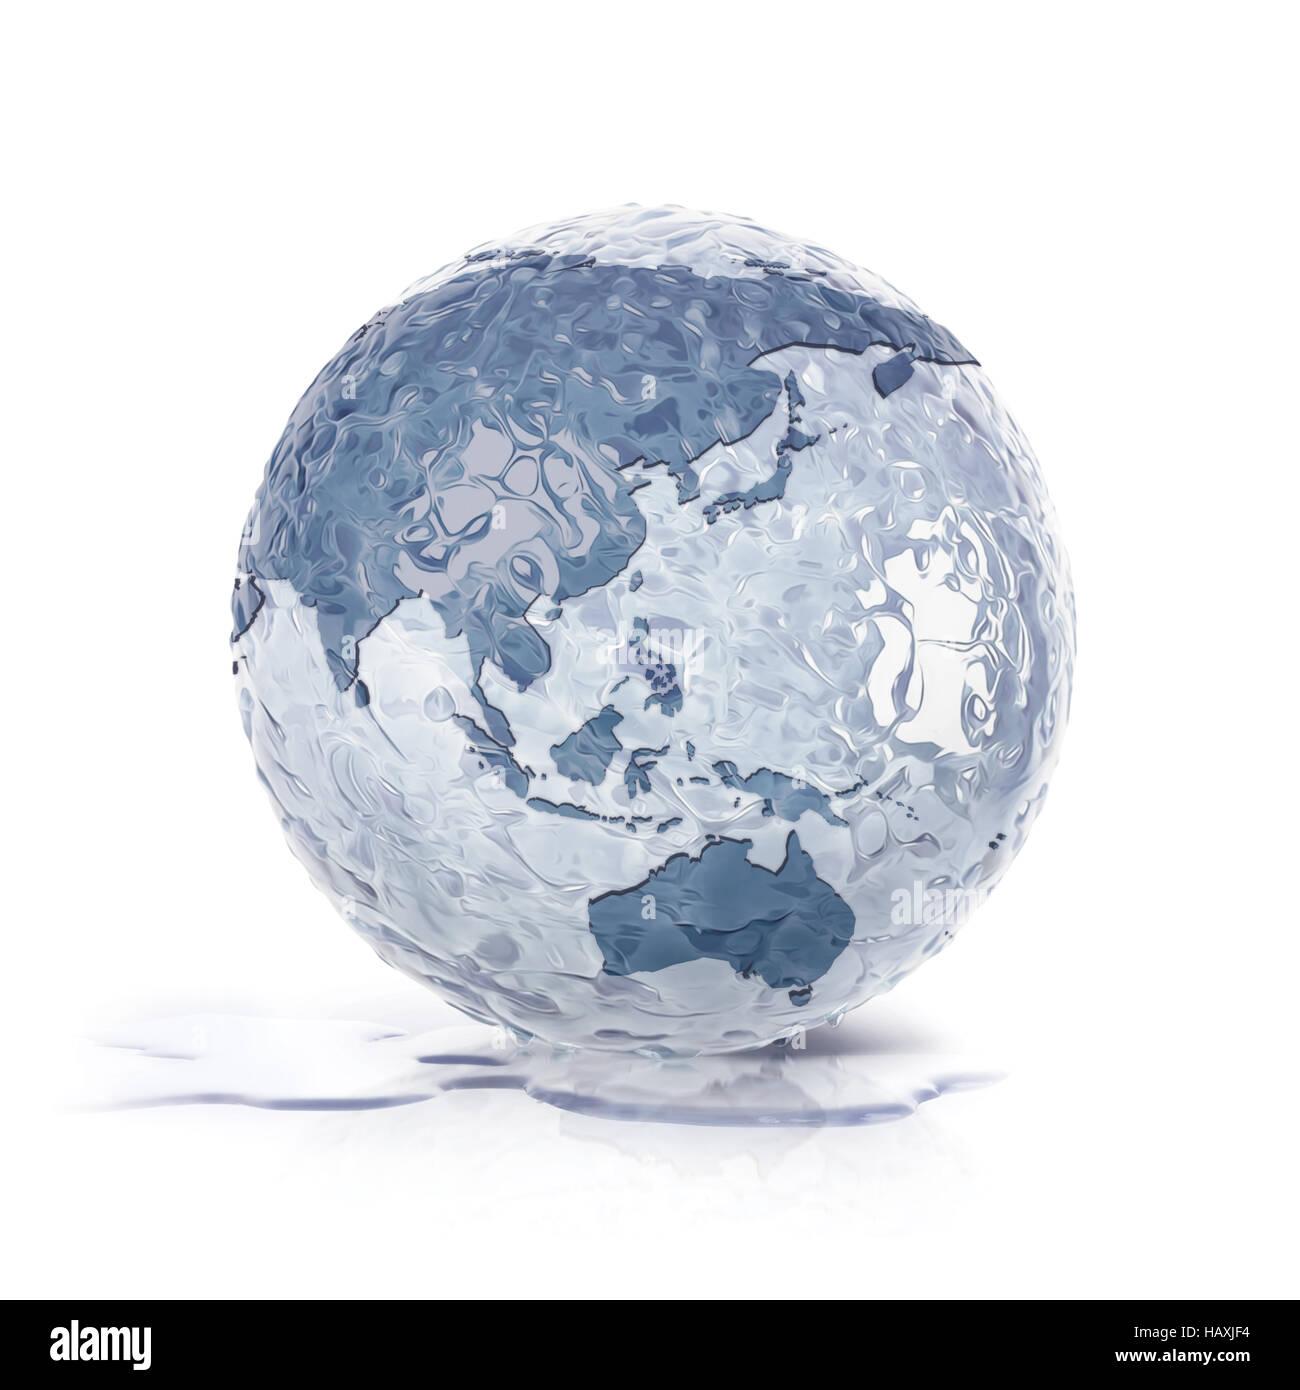 ice globe 3d illustration asia and australia map on white background